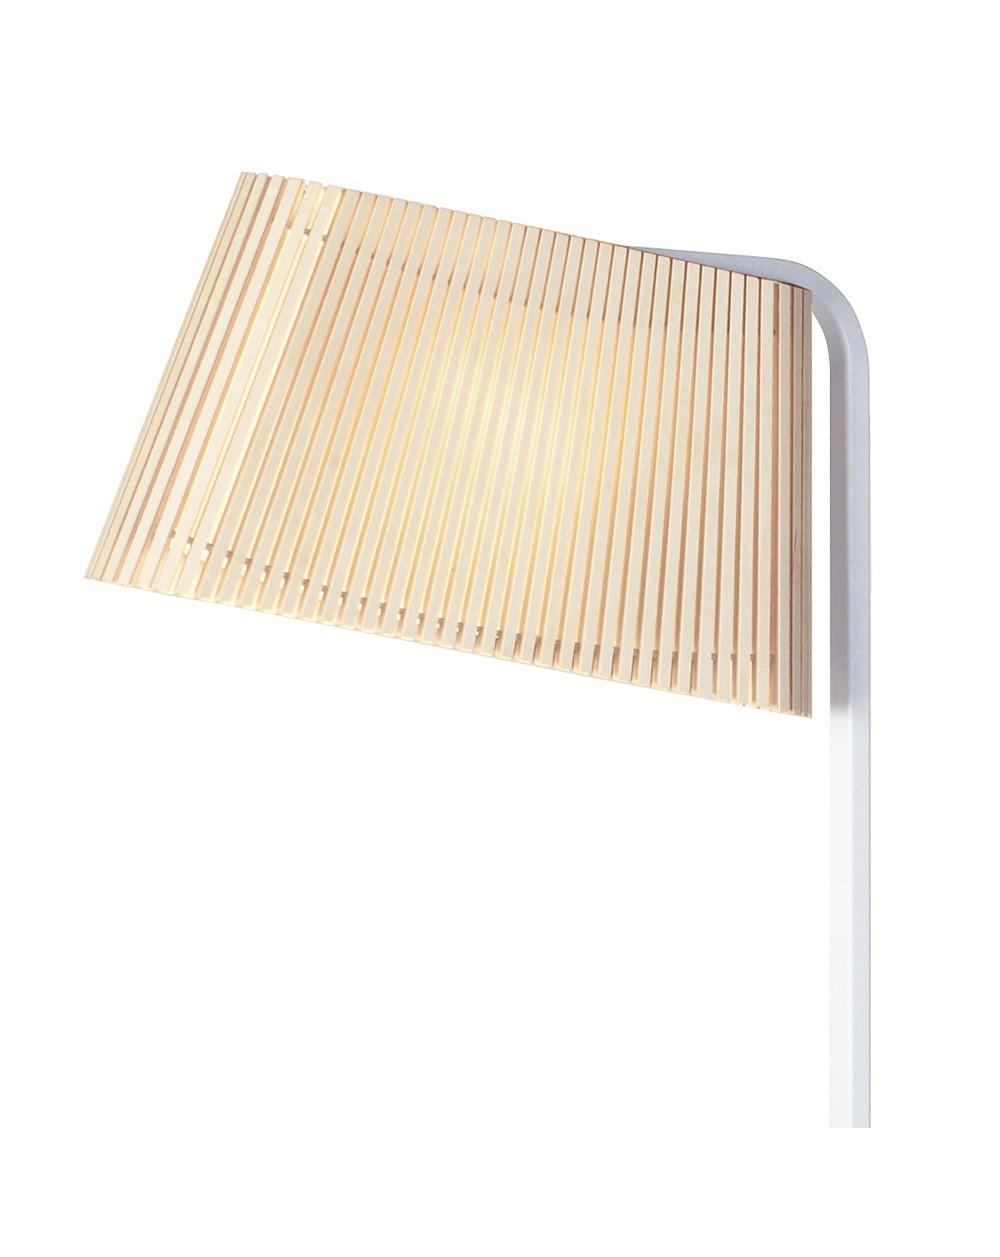 OWALO FLOOR LAMP